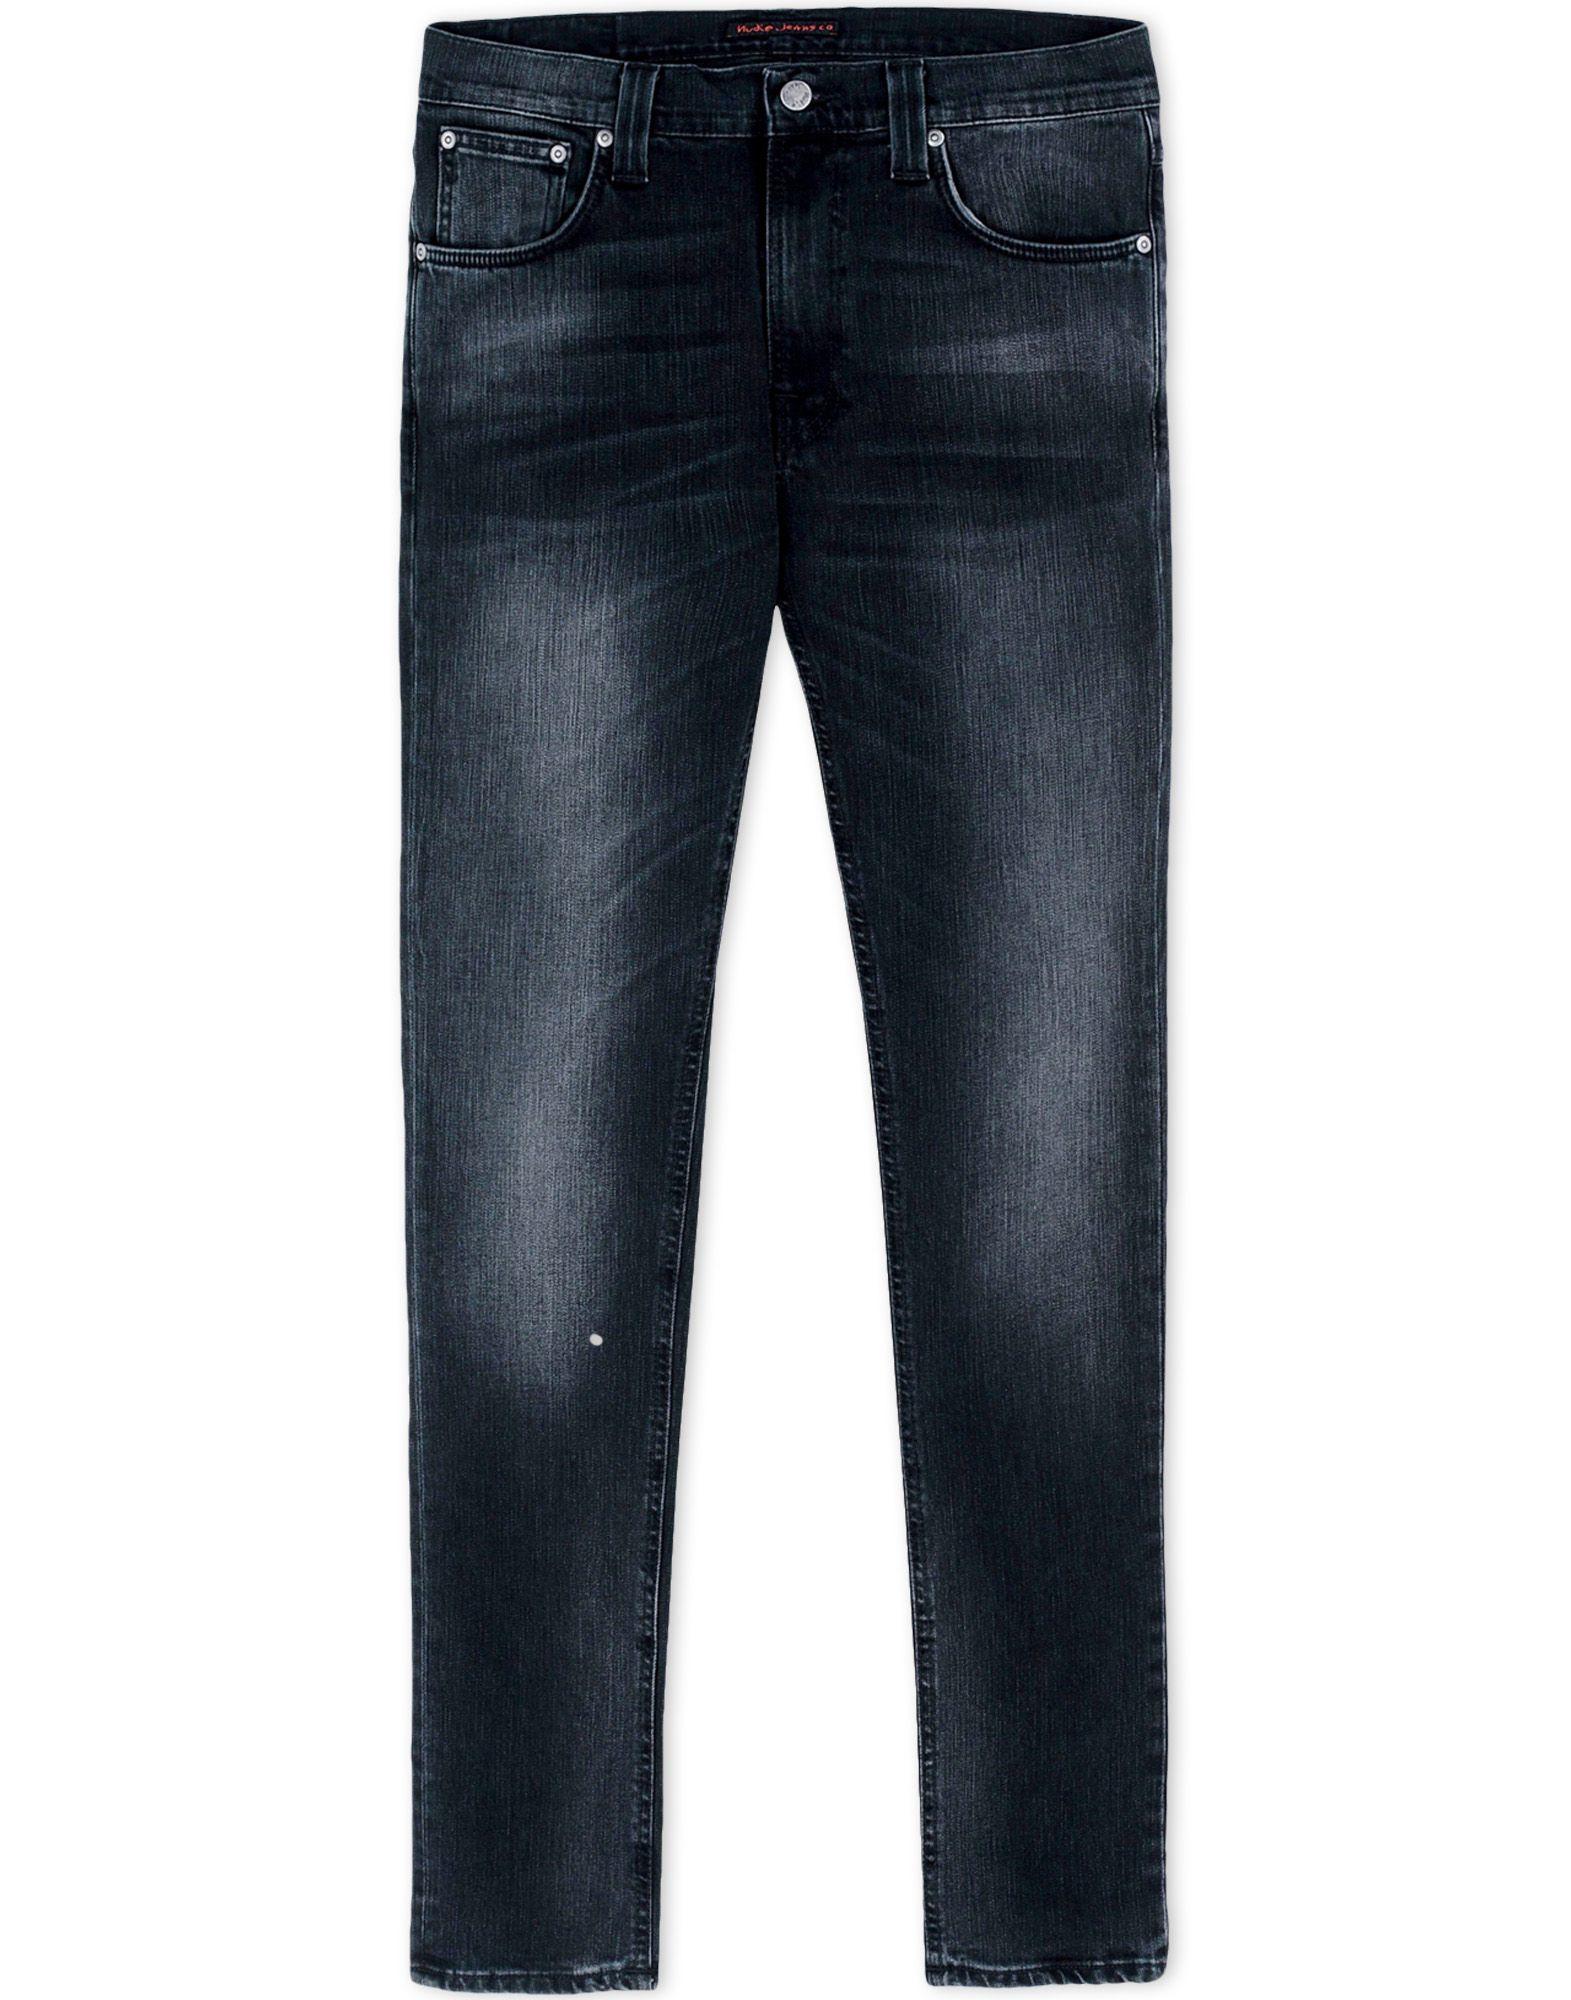 nudie jeans denim trousers in blue for men lyst. Black Bedroom Furniture Sets. Home Design Ideas